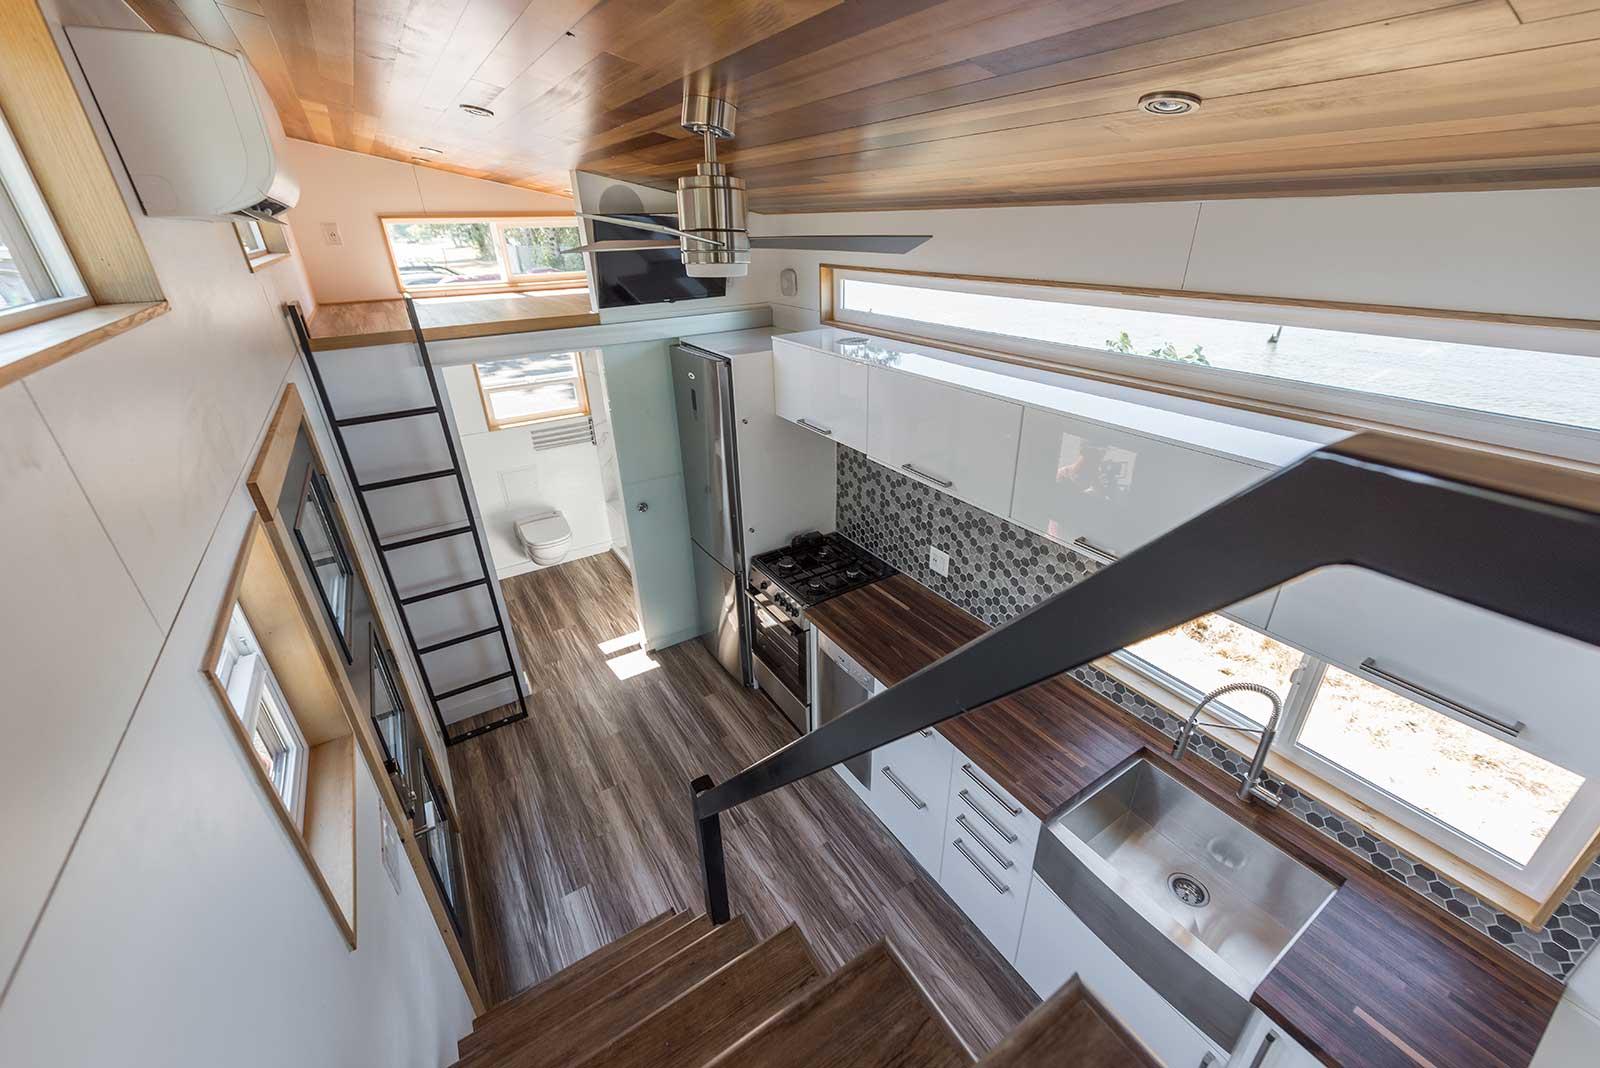 Catalina - Tiny Innovations on rv loft, off-grid homes with loft, design loft, diy loft, mobile home loft, cozy loft, tiny houses, california loft, small loft, prefab loft, micro house with loft,